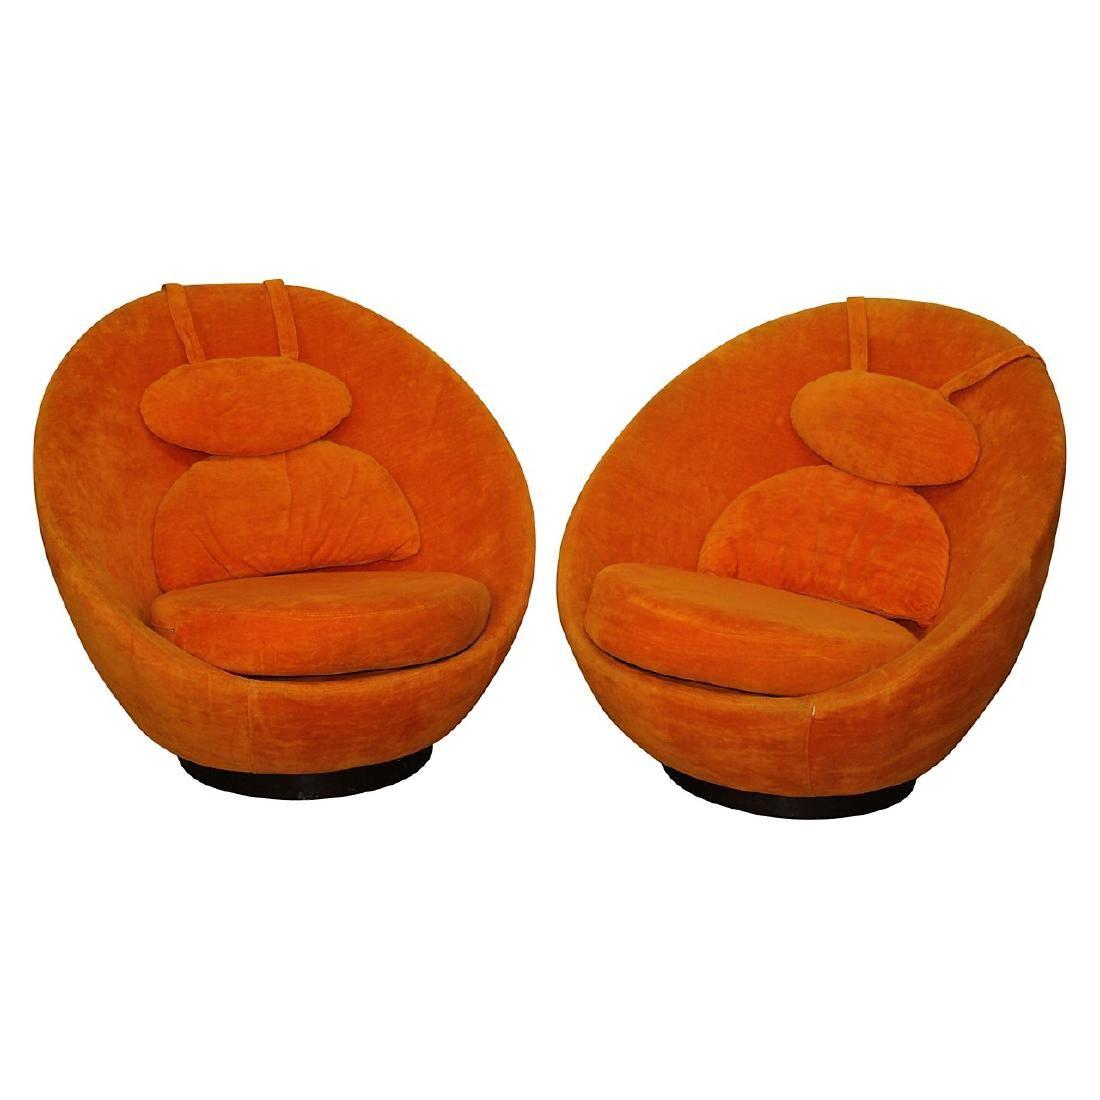 2 Milo Baughman for Thayer Coggin Swival Chairs